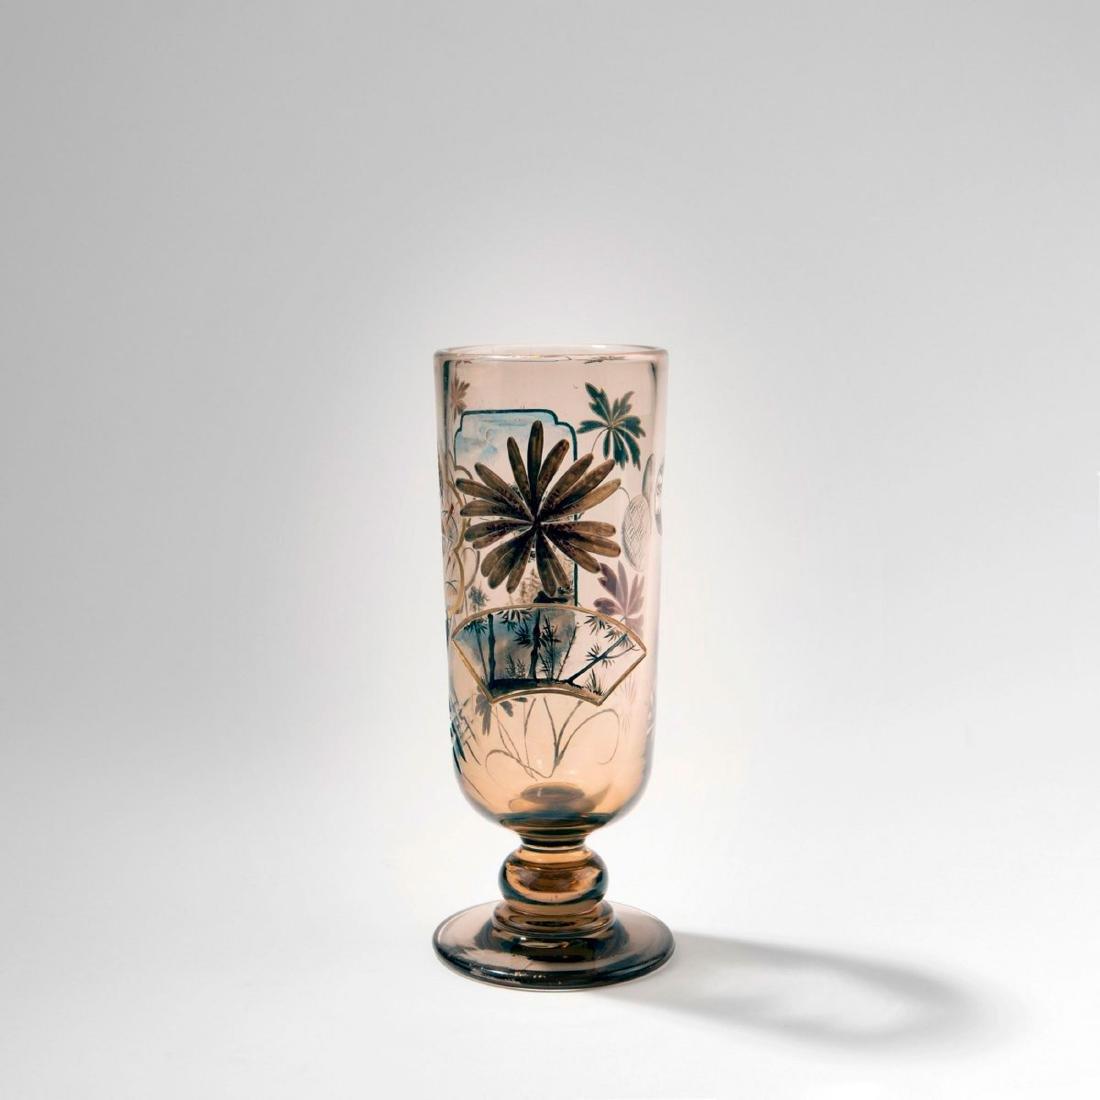 Historicising vase, c. 1887 - 2